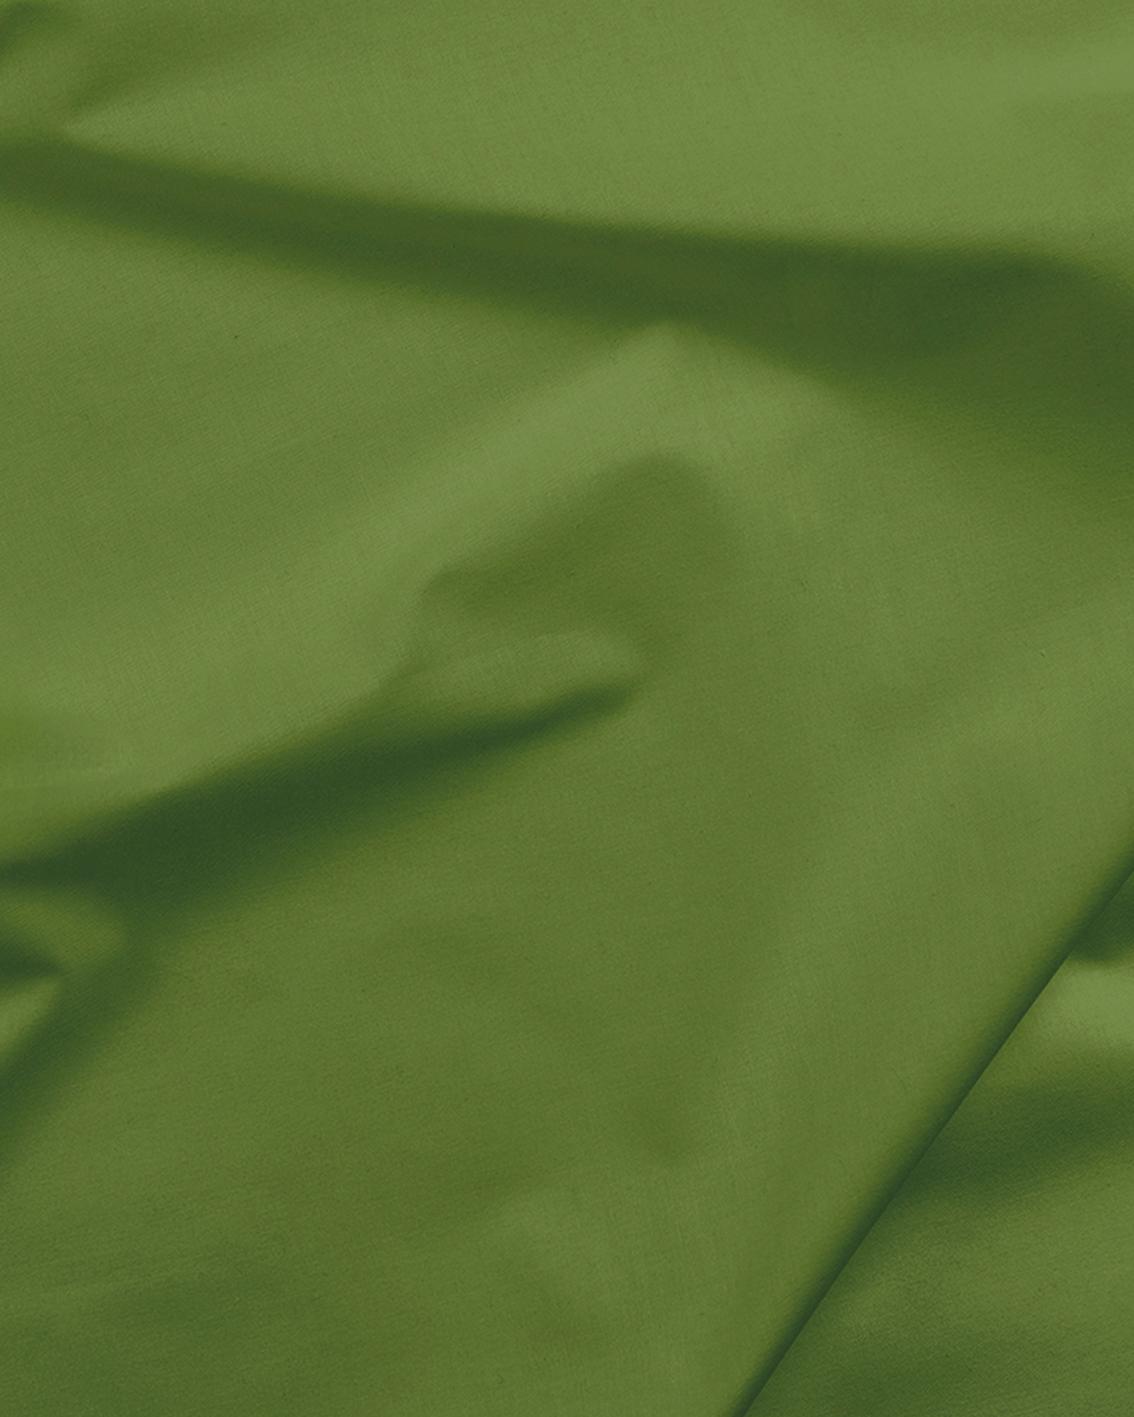 Bawełna pętelkowa typu dresówka. Kolor khaki. Gramatura 240g.